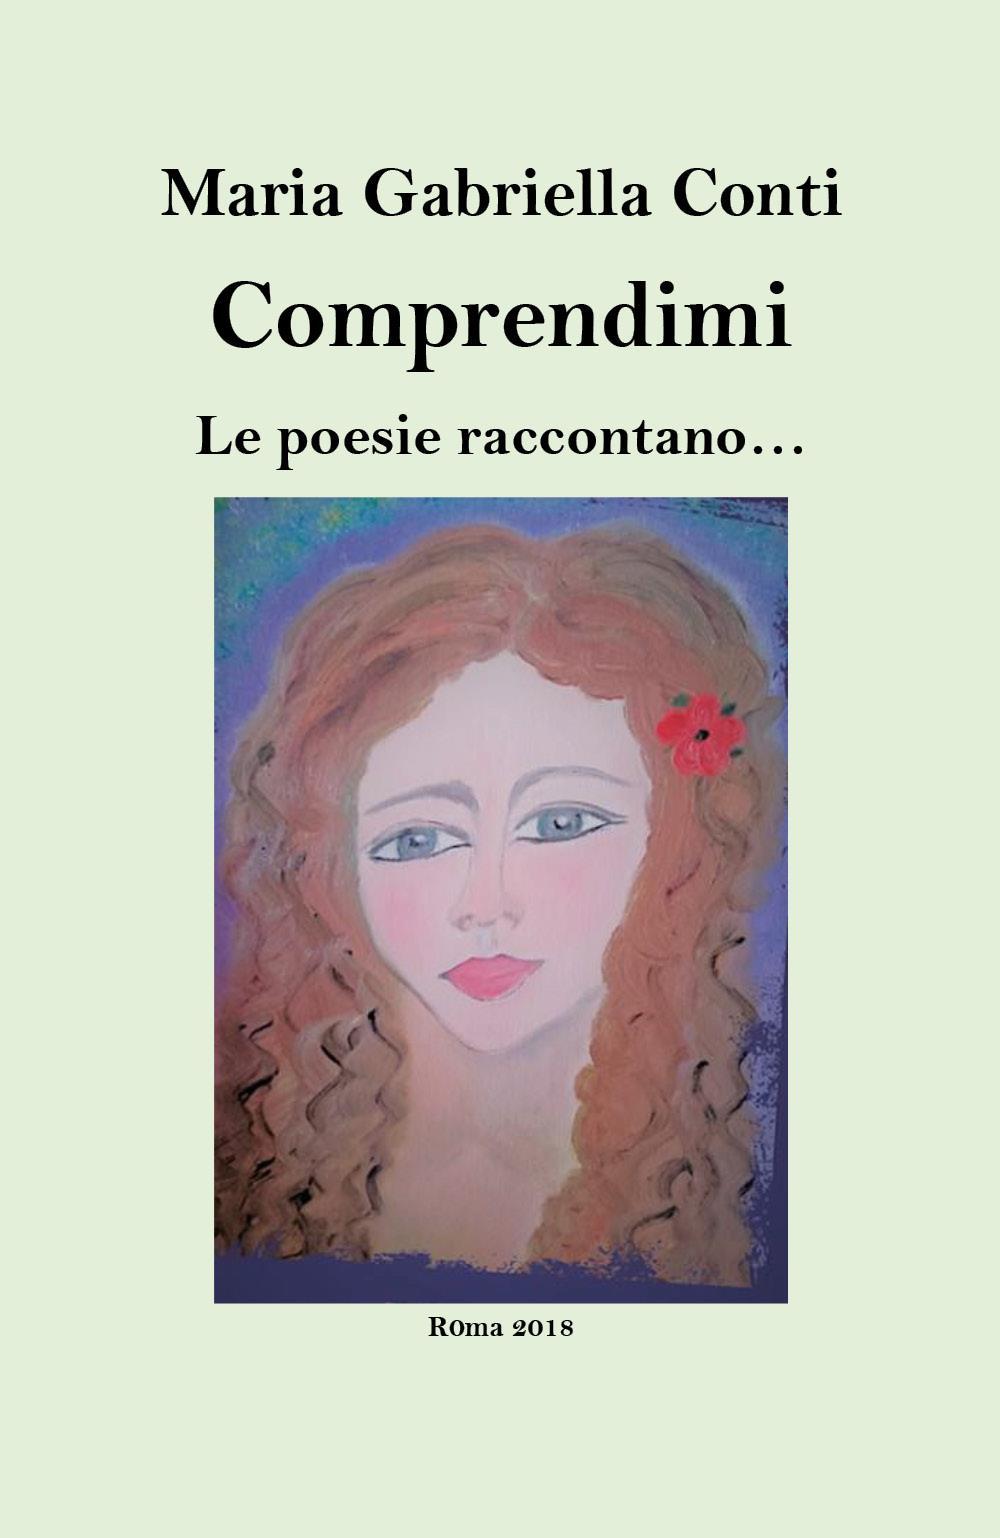 Comprendimi - Le poesie raccontano